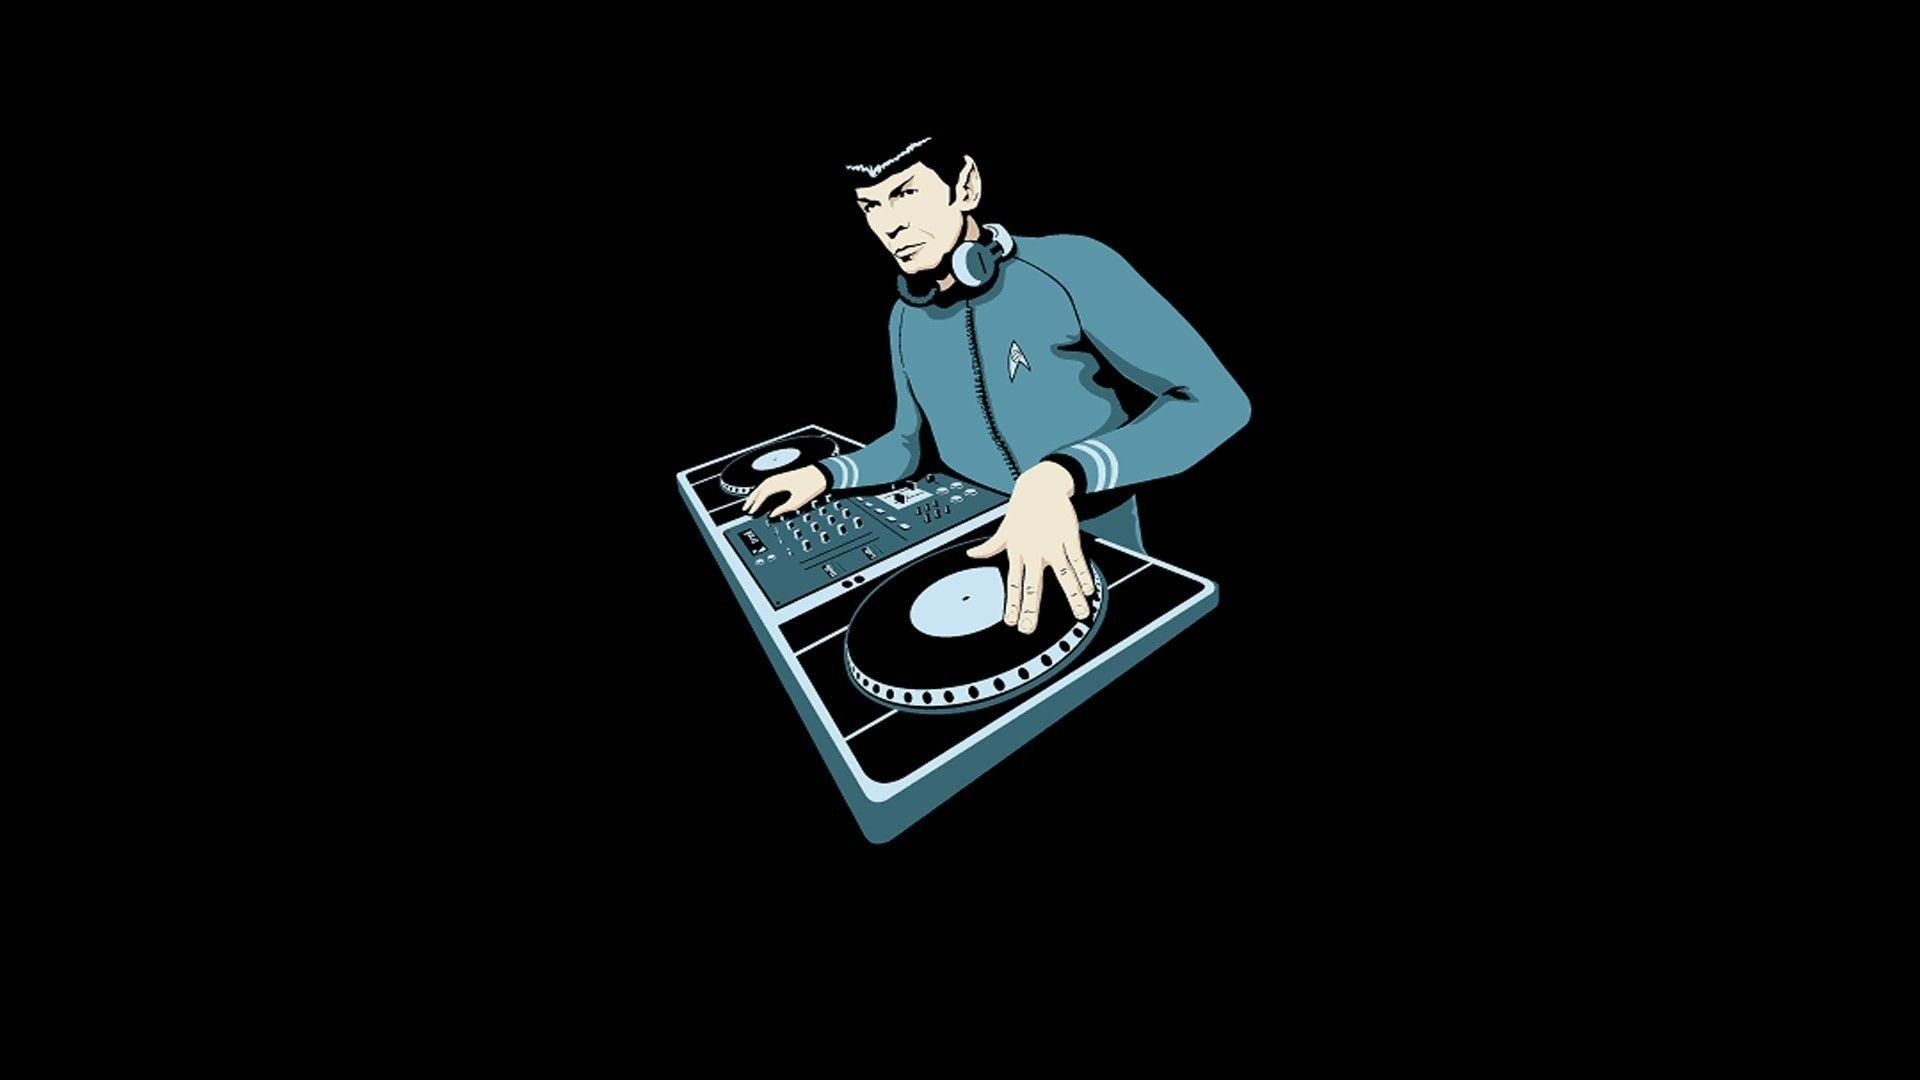 Star Trek Wallpaper: A place to deposit Star Trek desktop .